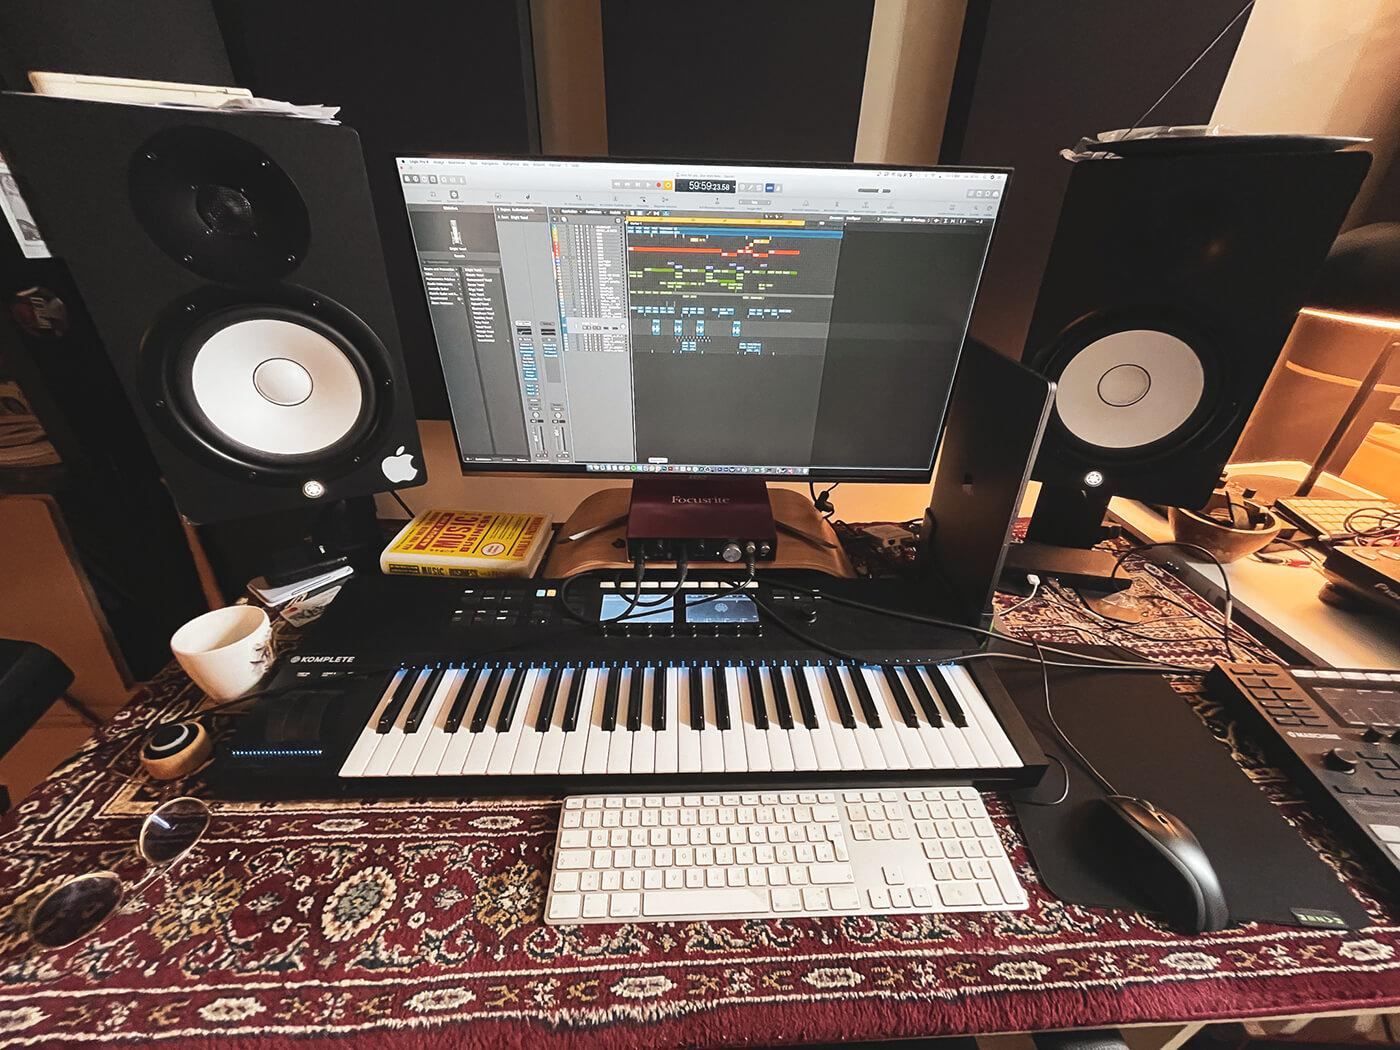 Demuja's Desk